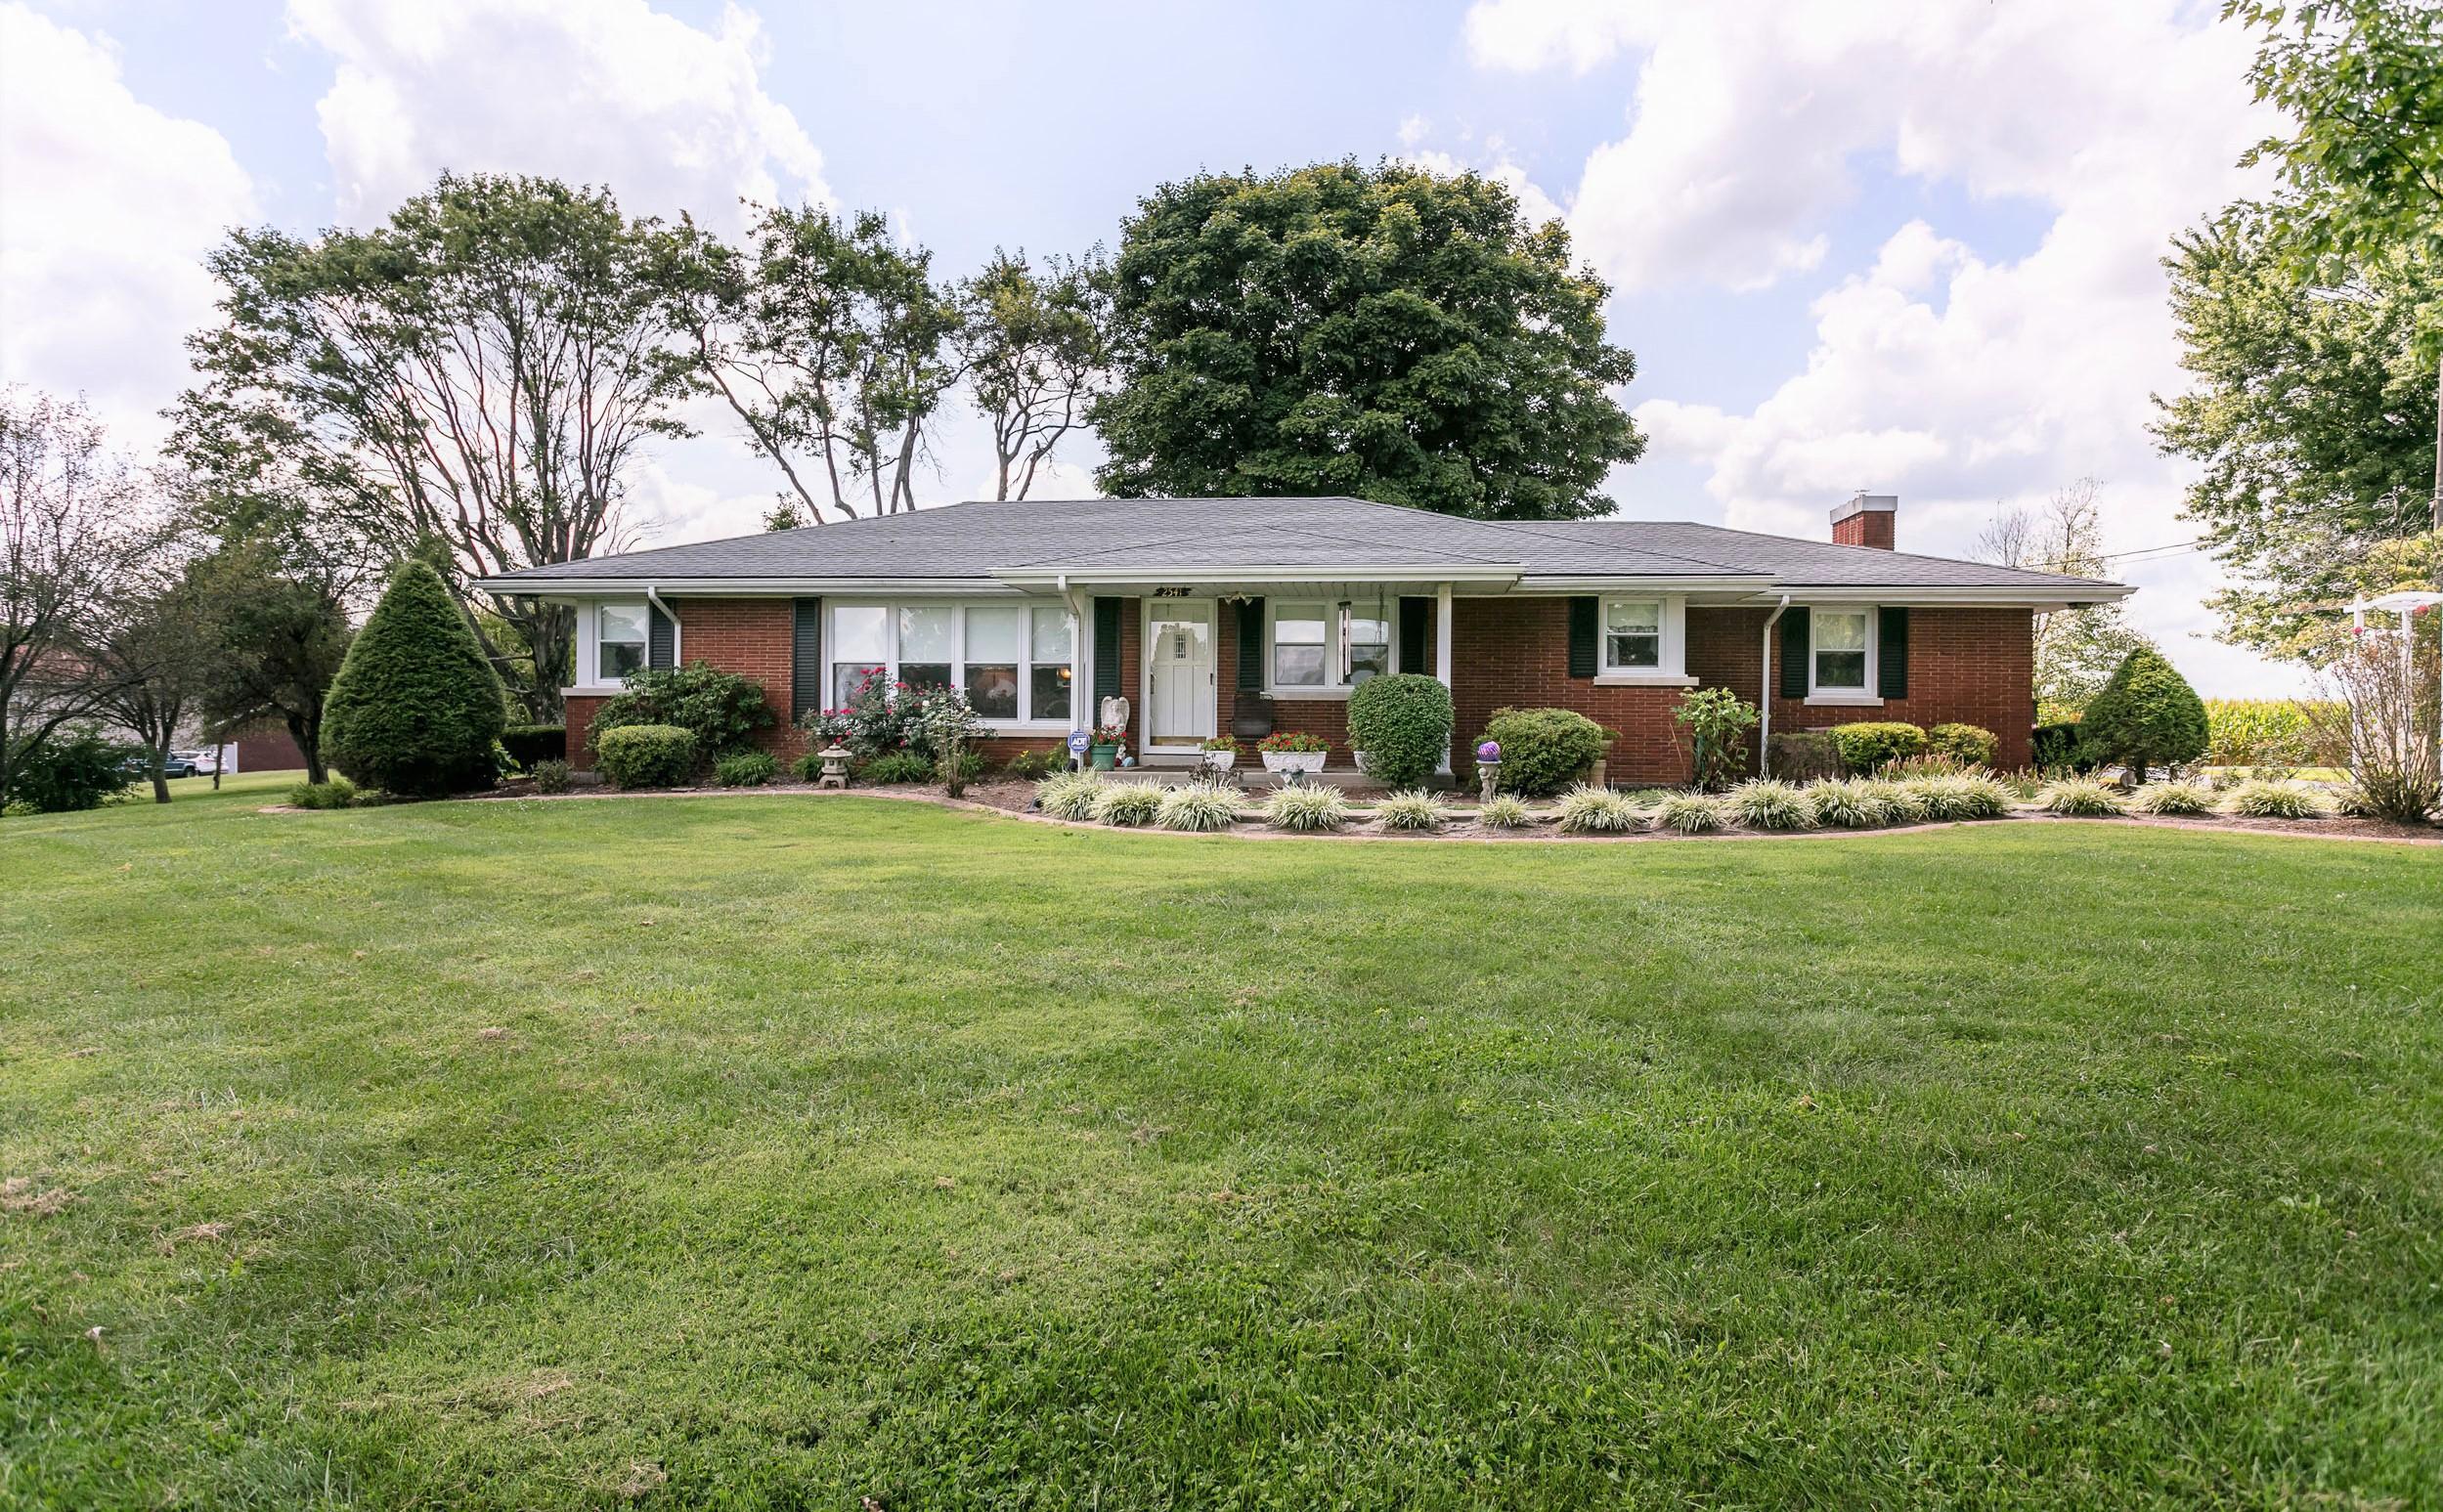 2541 Old Lebanon Road – Campbellsville